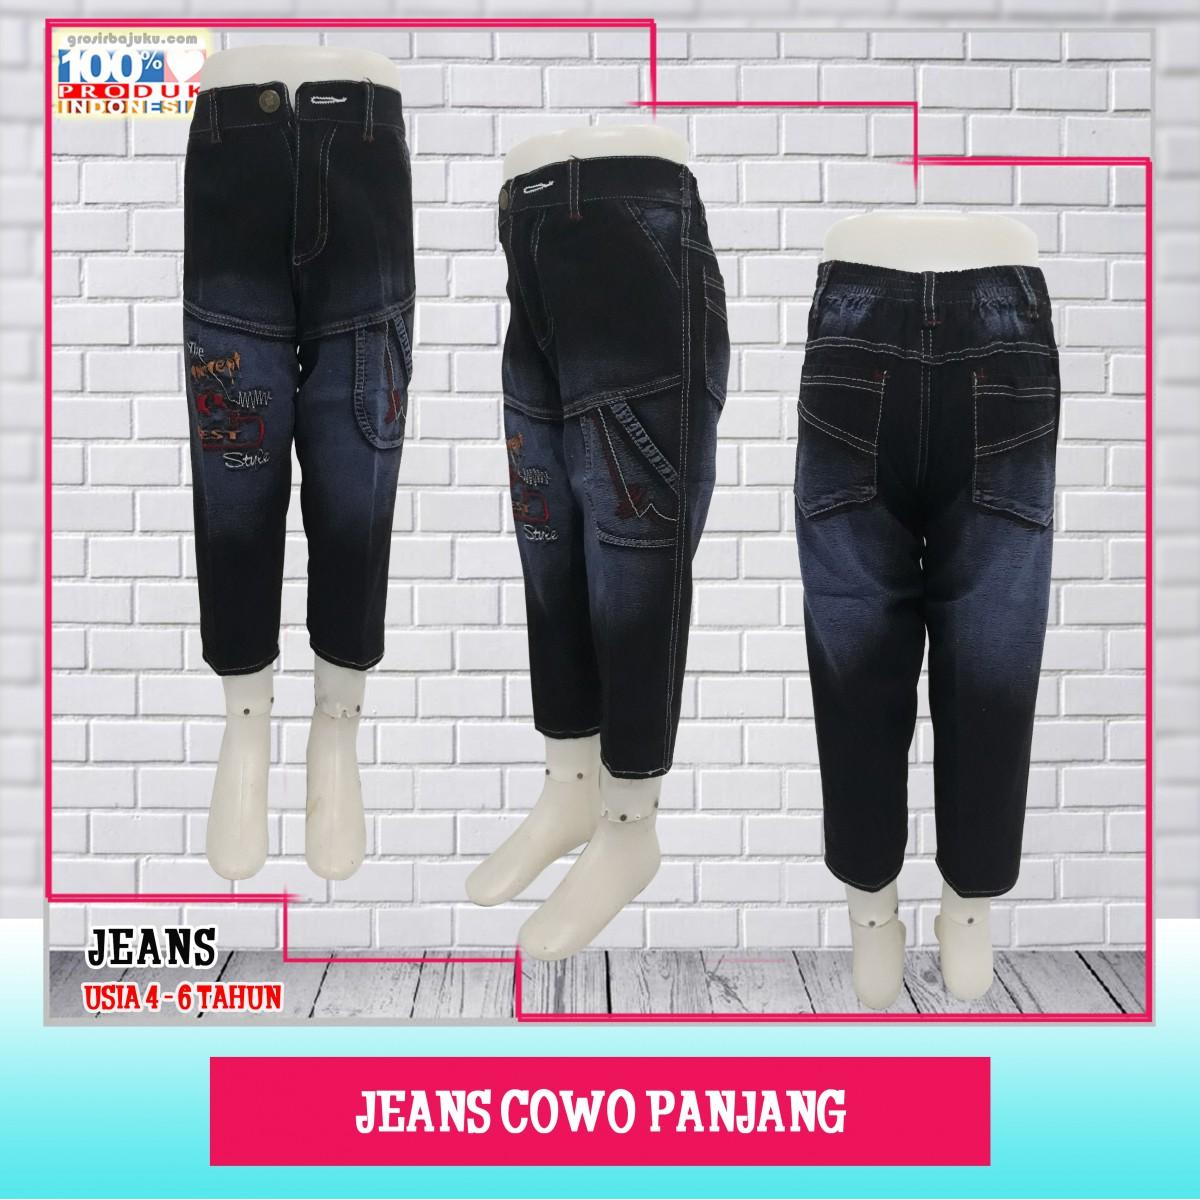 Pusat Obral Grosir Baju Anak 5000 Mukena Katun Jepang Murah Meriah Langsung Dari Pabrik Konveksi Jeans Panjang Cowo Rp 25,000